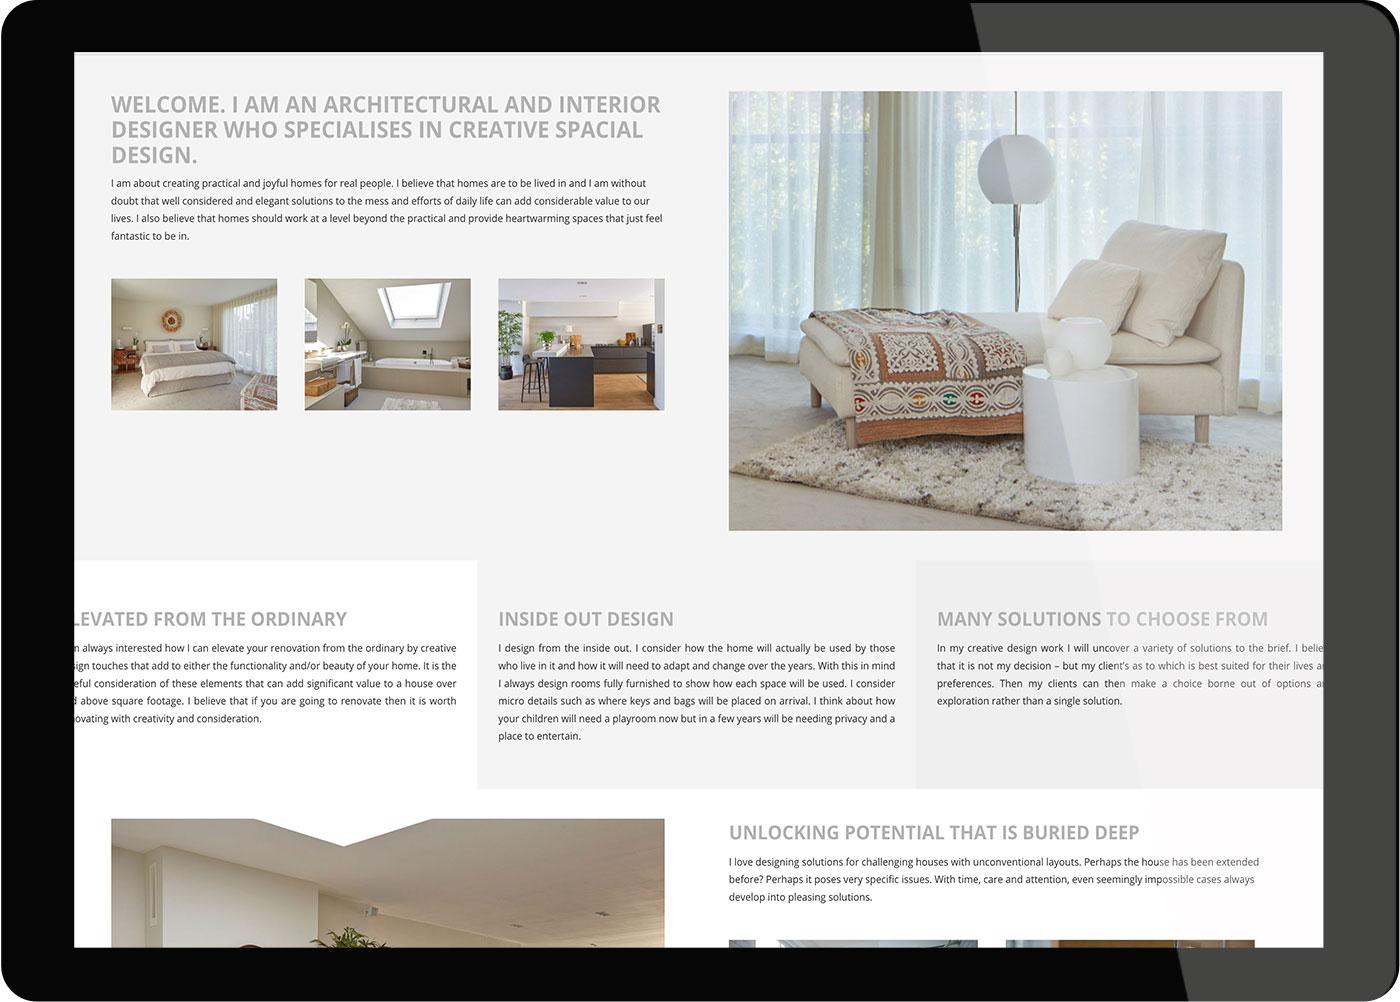 Tigerpink Design - Emma Stoddart - iPad